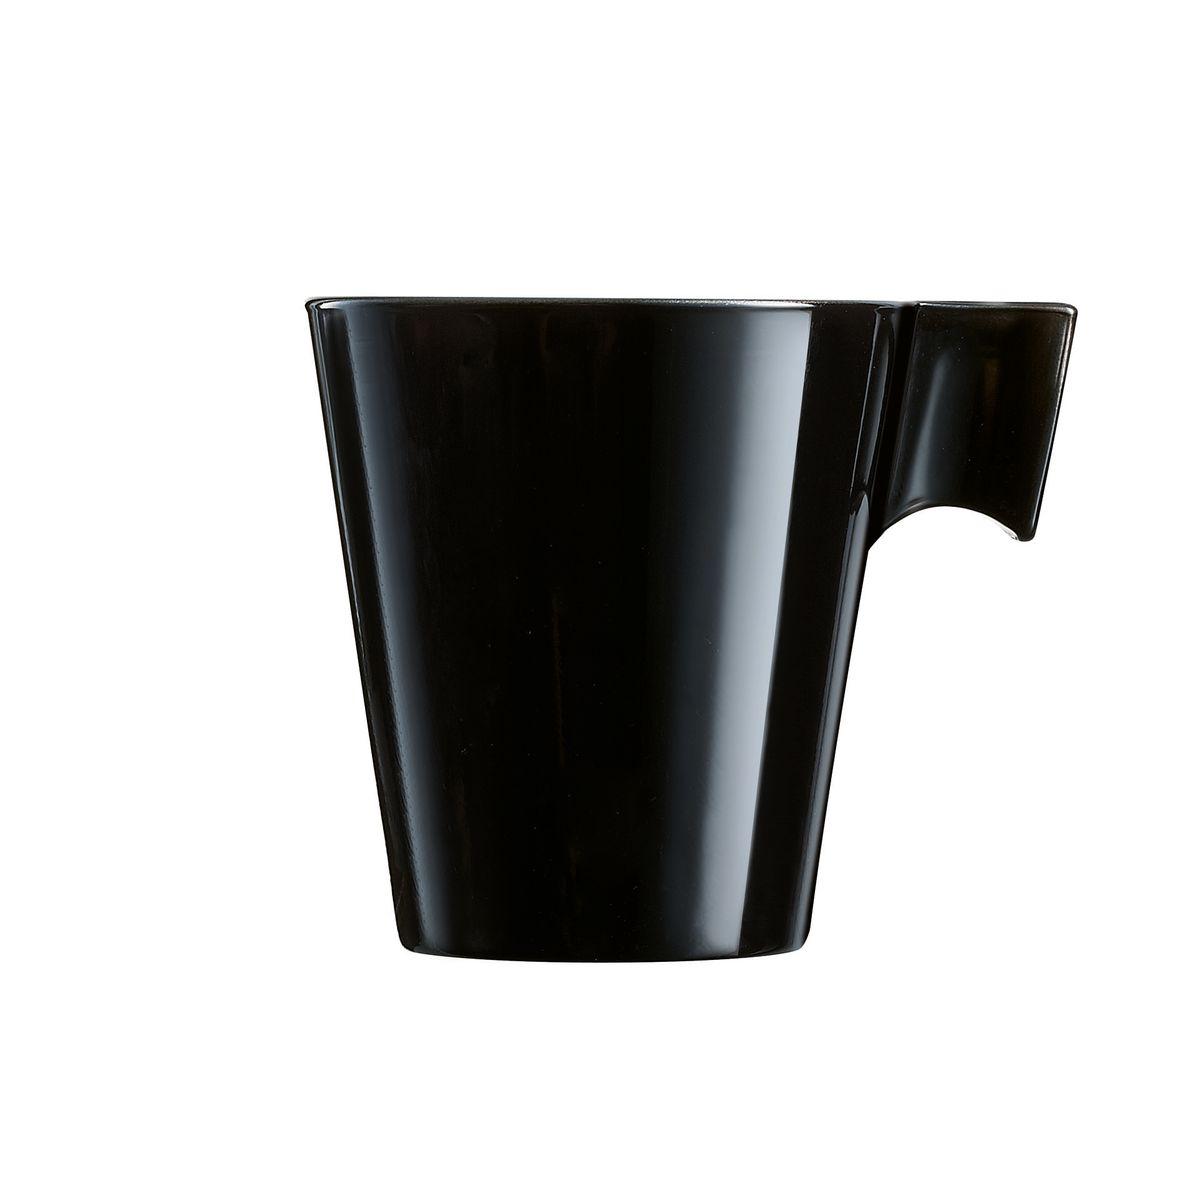 Tasse expresso noire 8cl